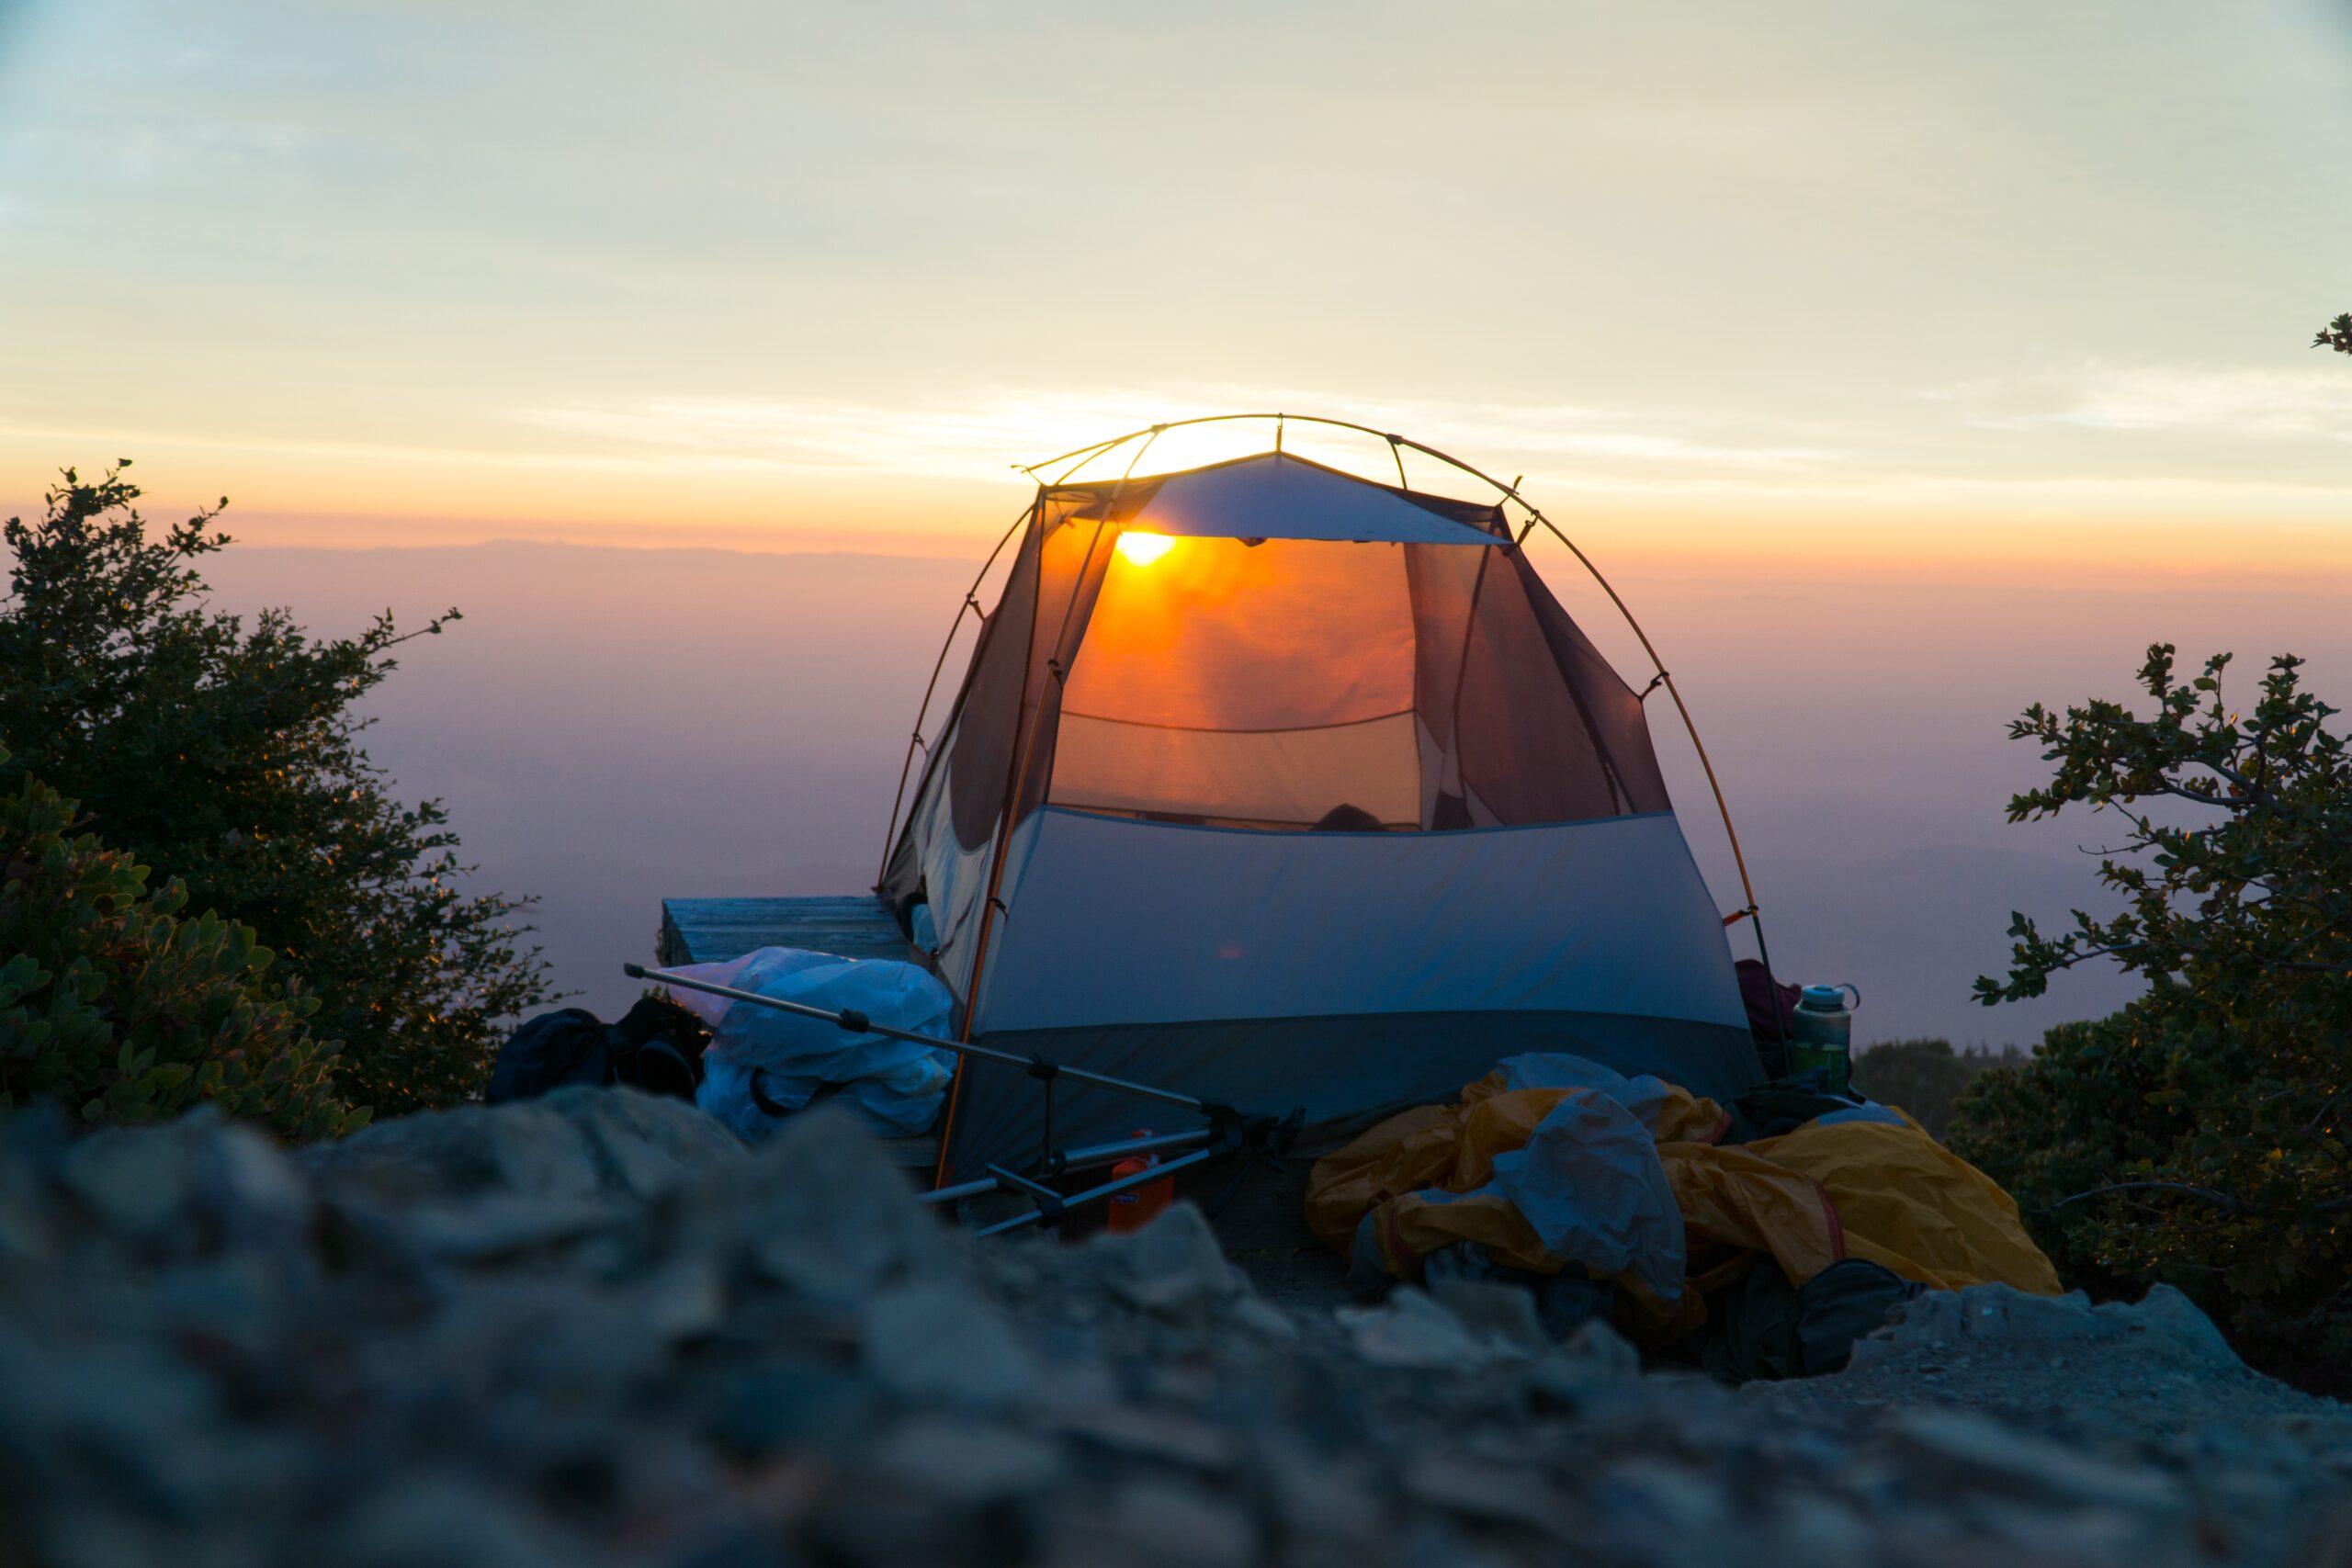 sun raise behind dome tent